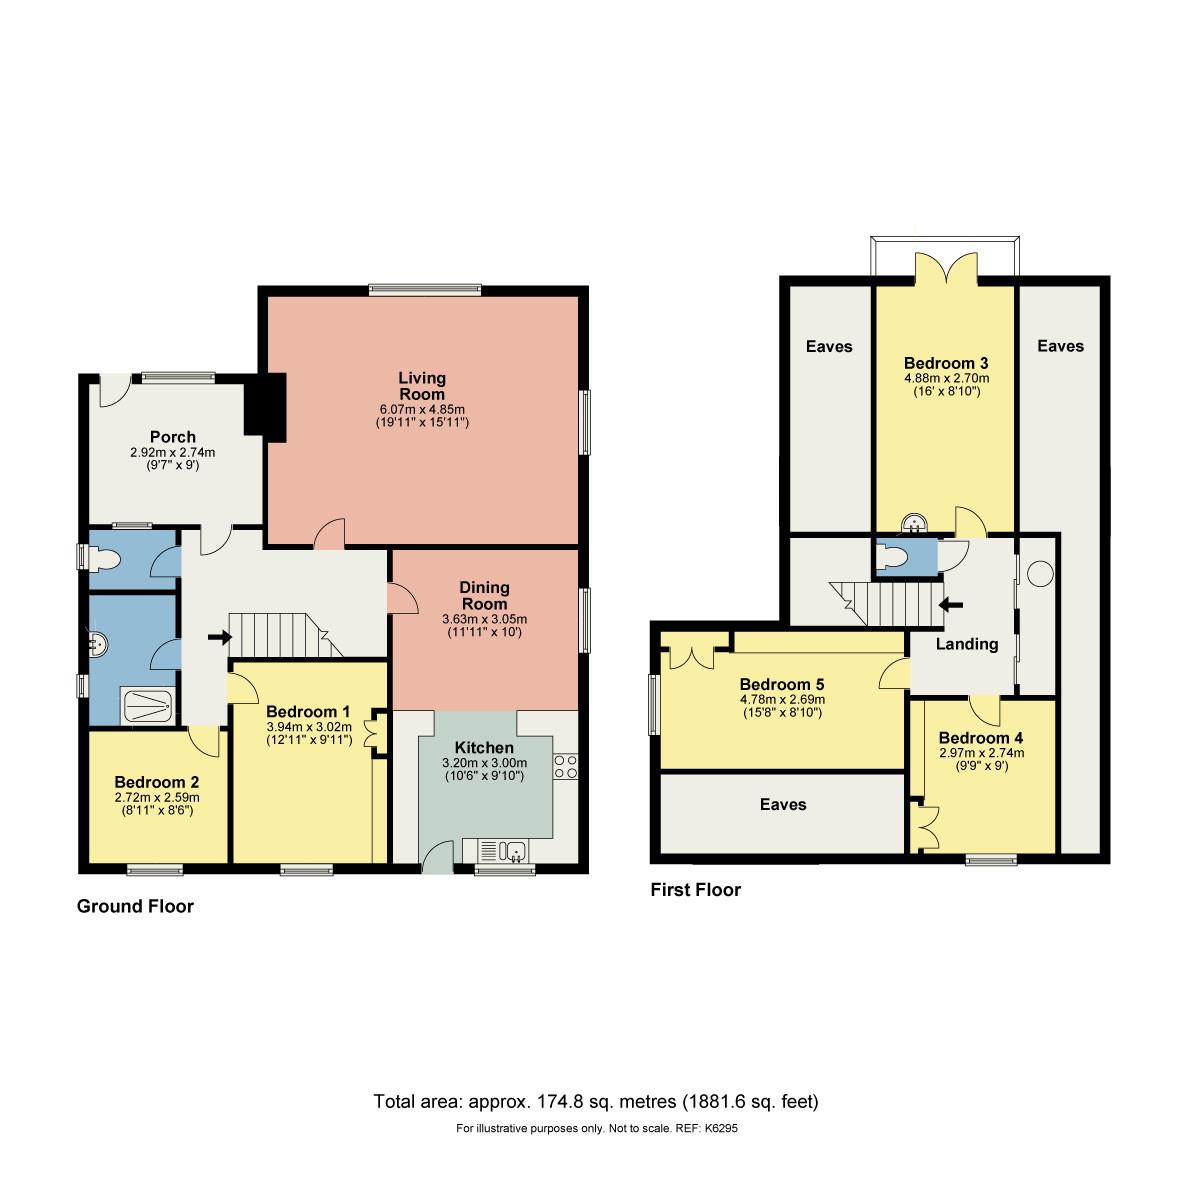 Floorplan Fairways, Church Road, Levens, Kendal, Cumbria, LA8 8PS